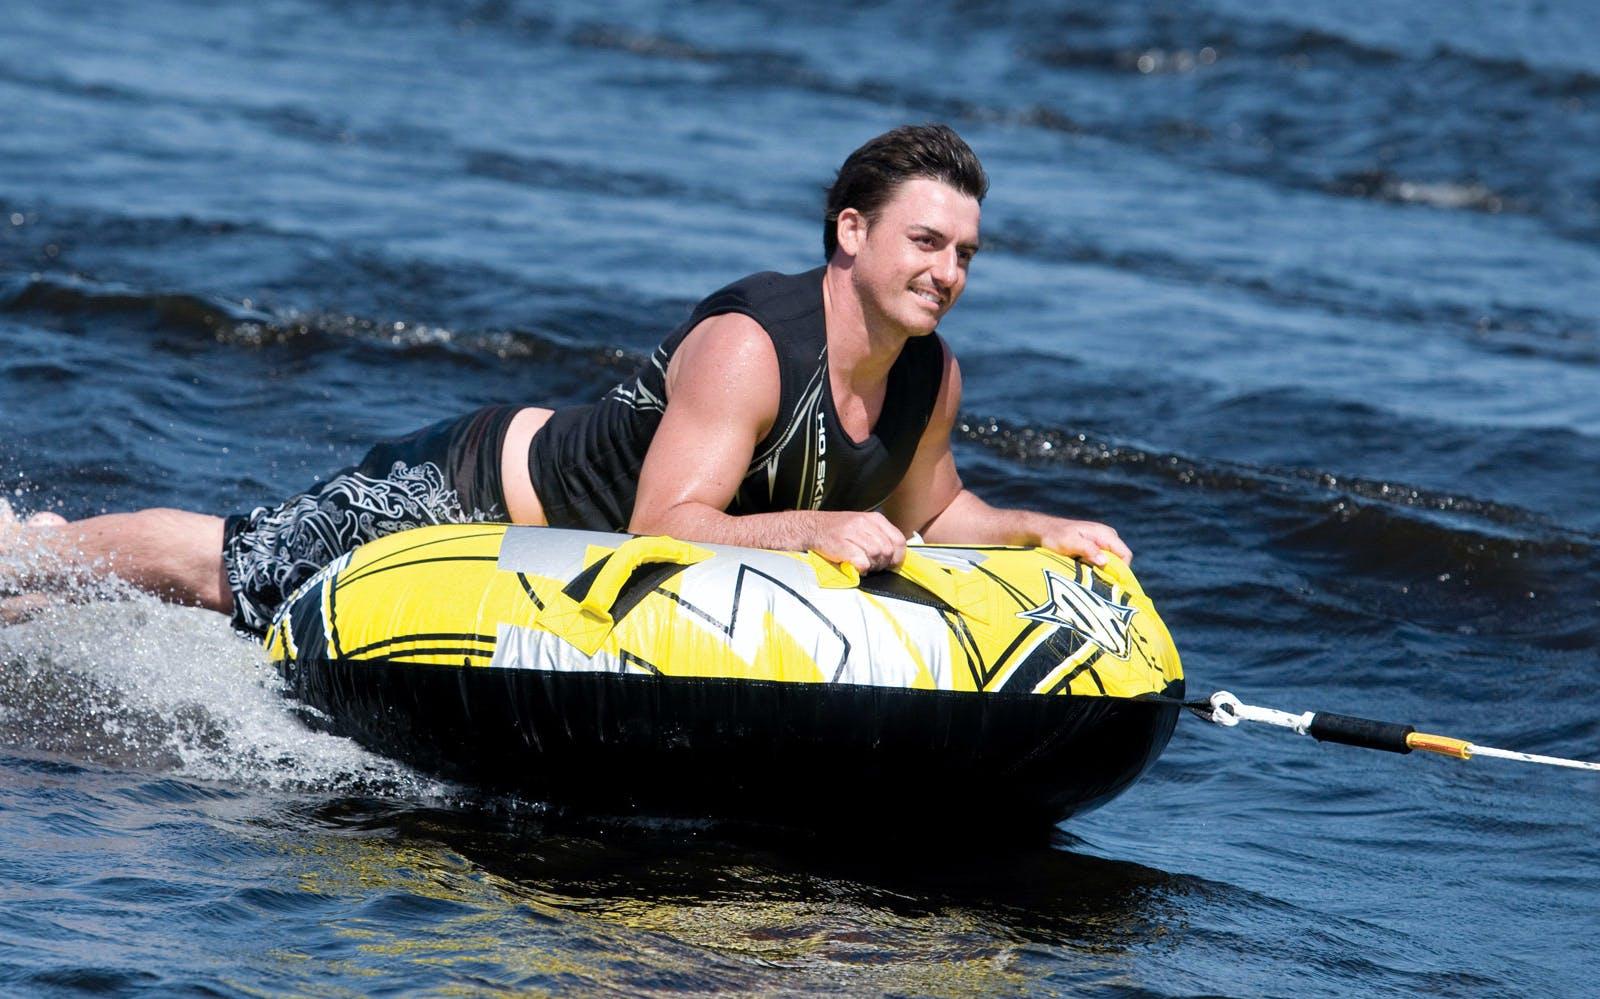 Water sports in Dubai - donut ride